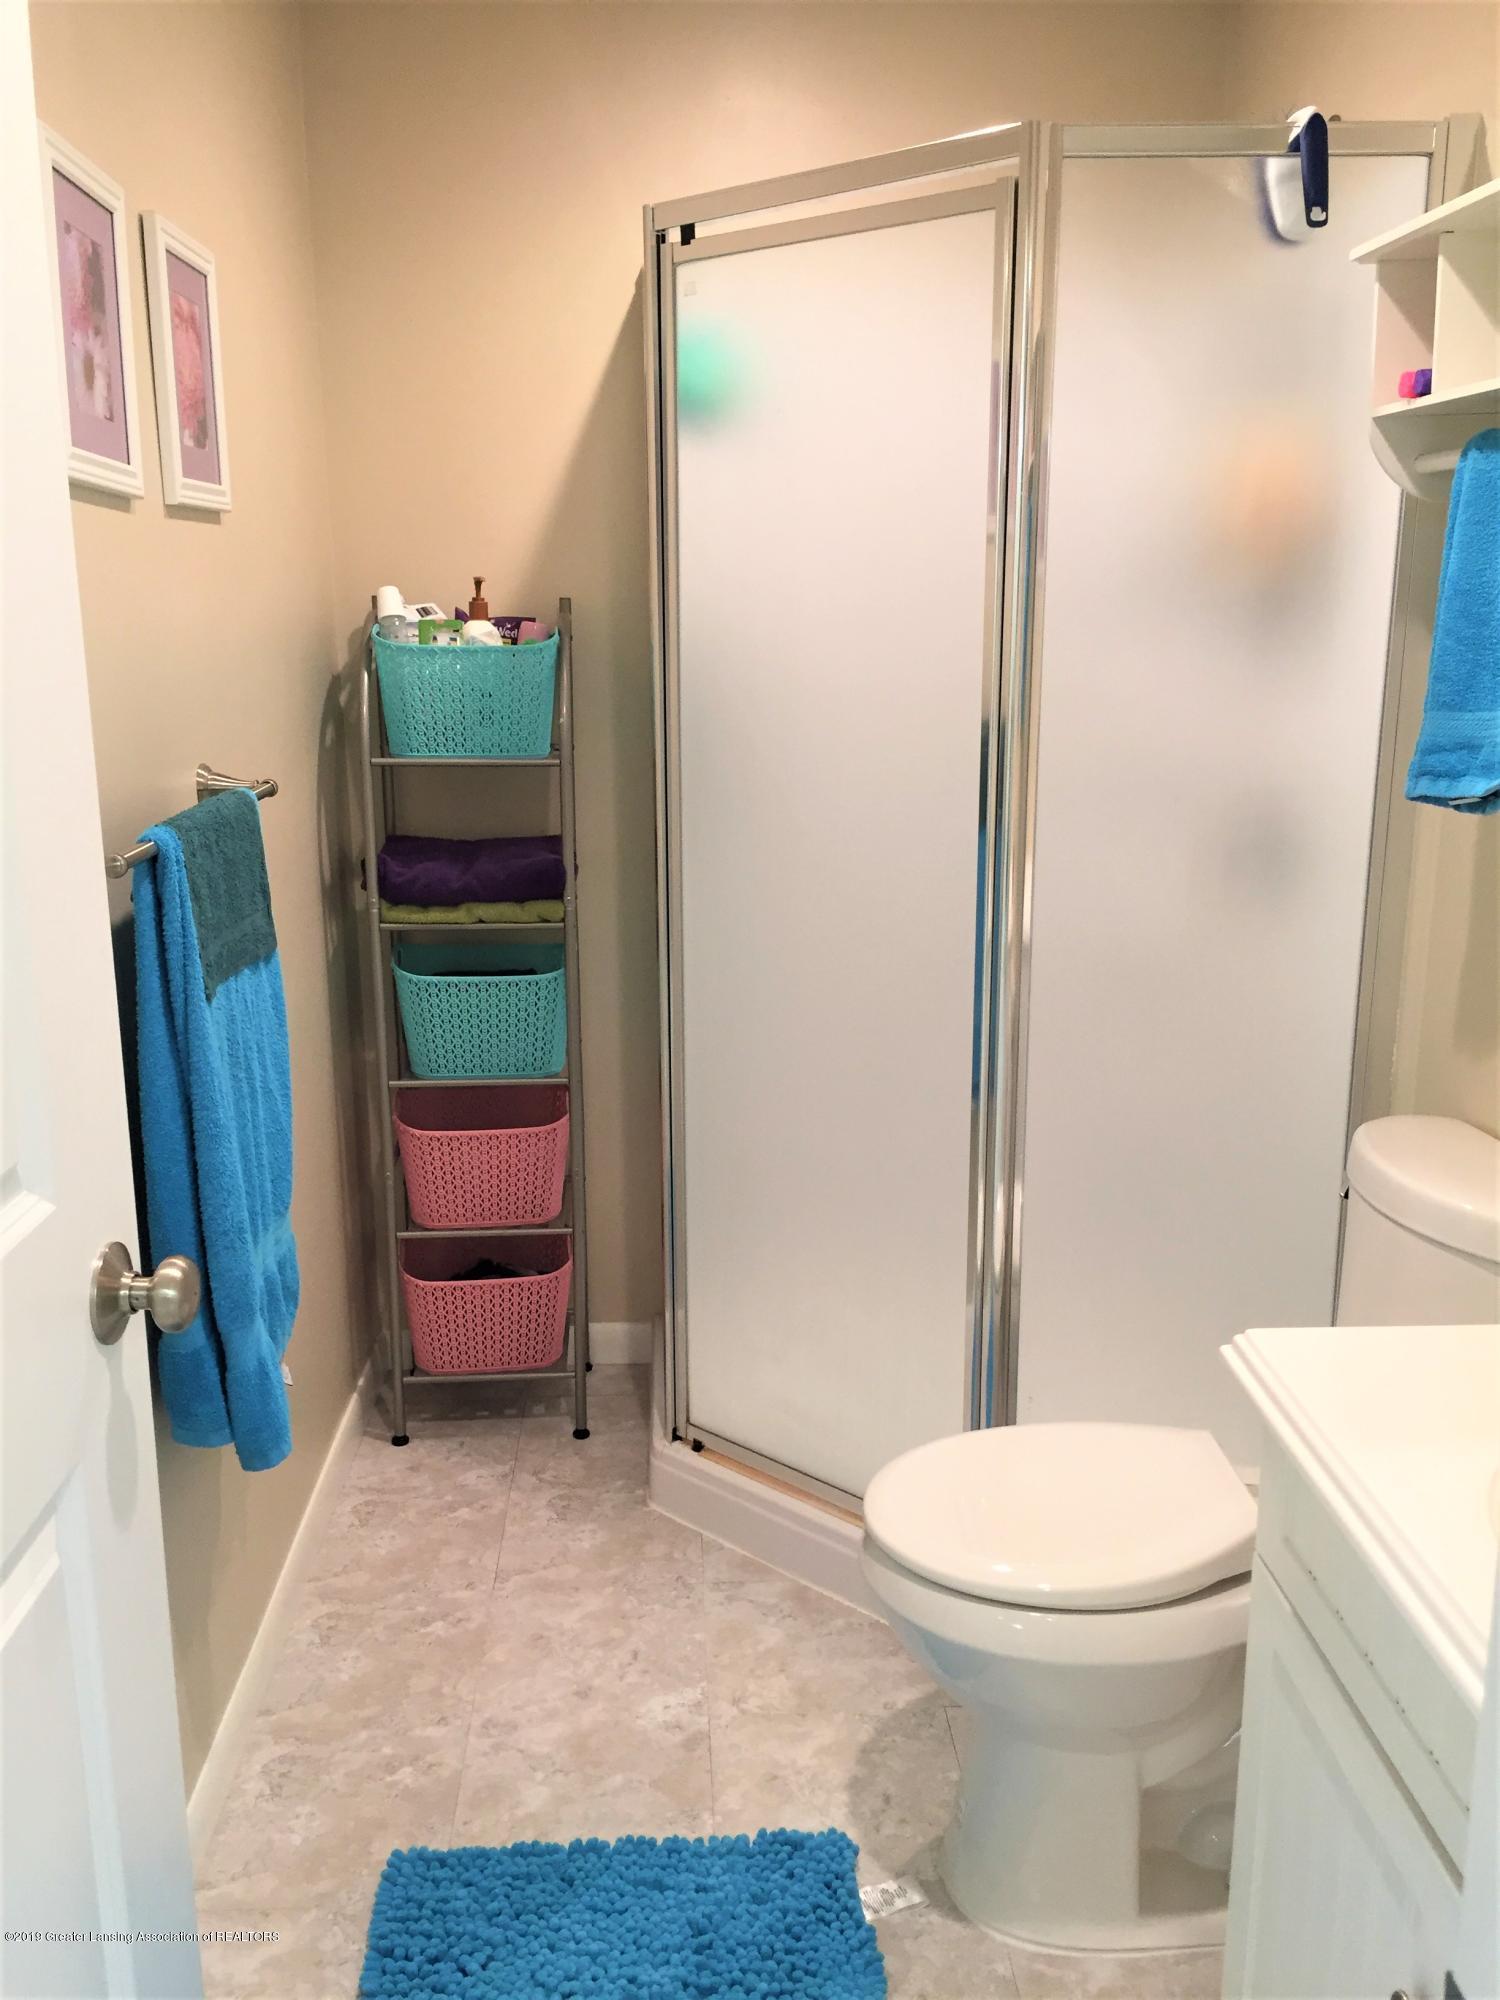 8617 Wheatdale Dr - Bathroom in Basement - 61